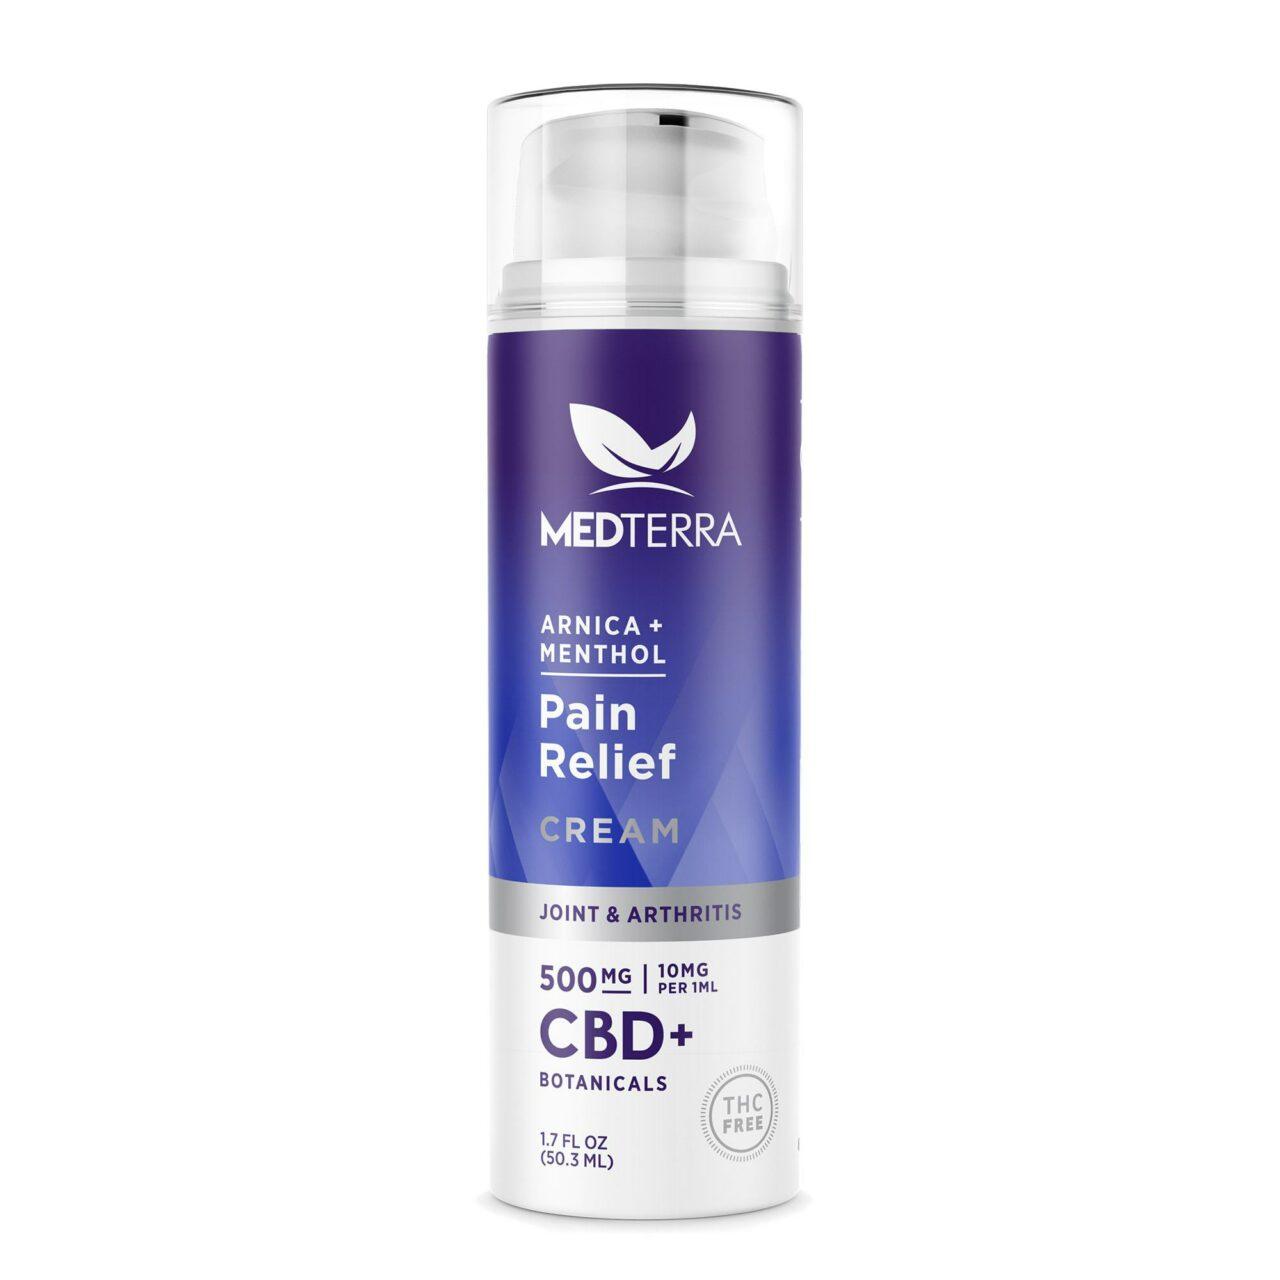 Medterra, Pain Relief CBD Cream, Isolate THC-Free, 1.7oz, 500mg CBD 1